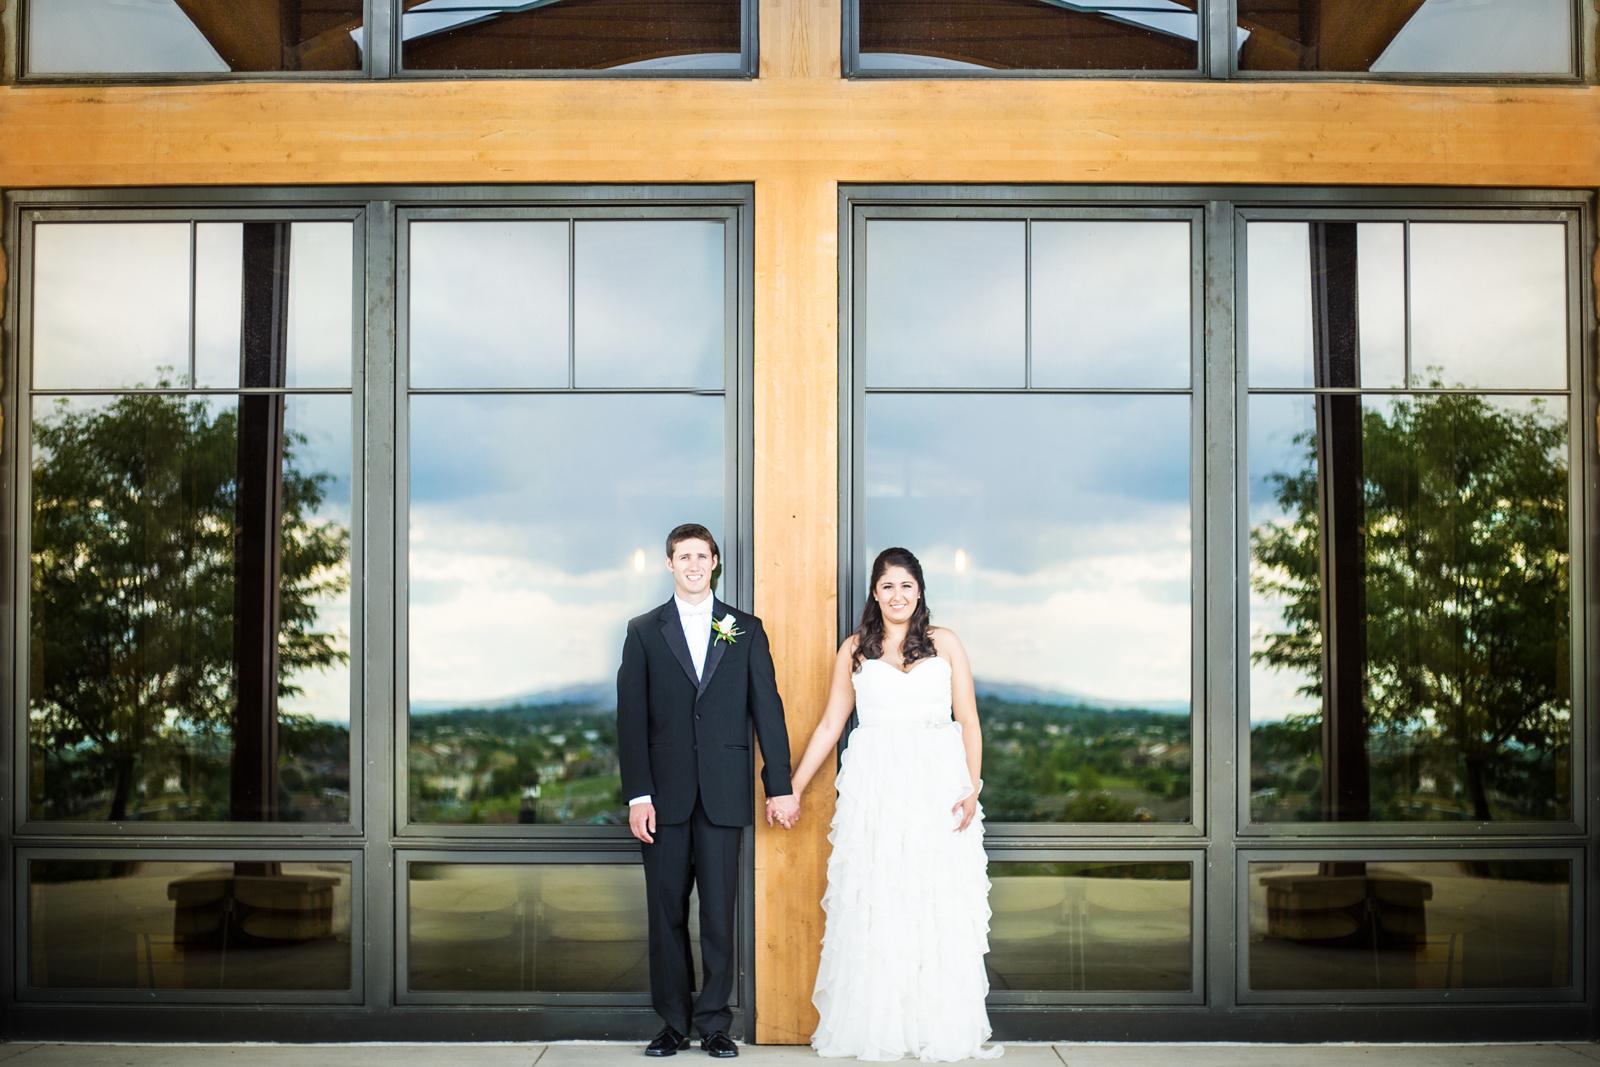 2d90f97f2385957a-AdamJordan_weddingWindow.jpg